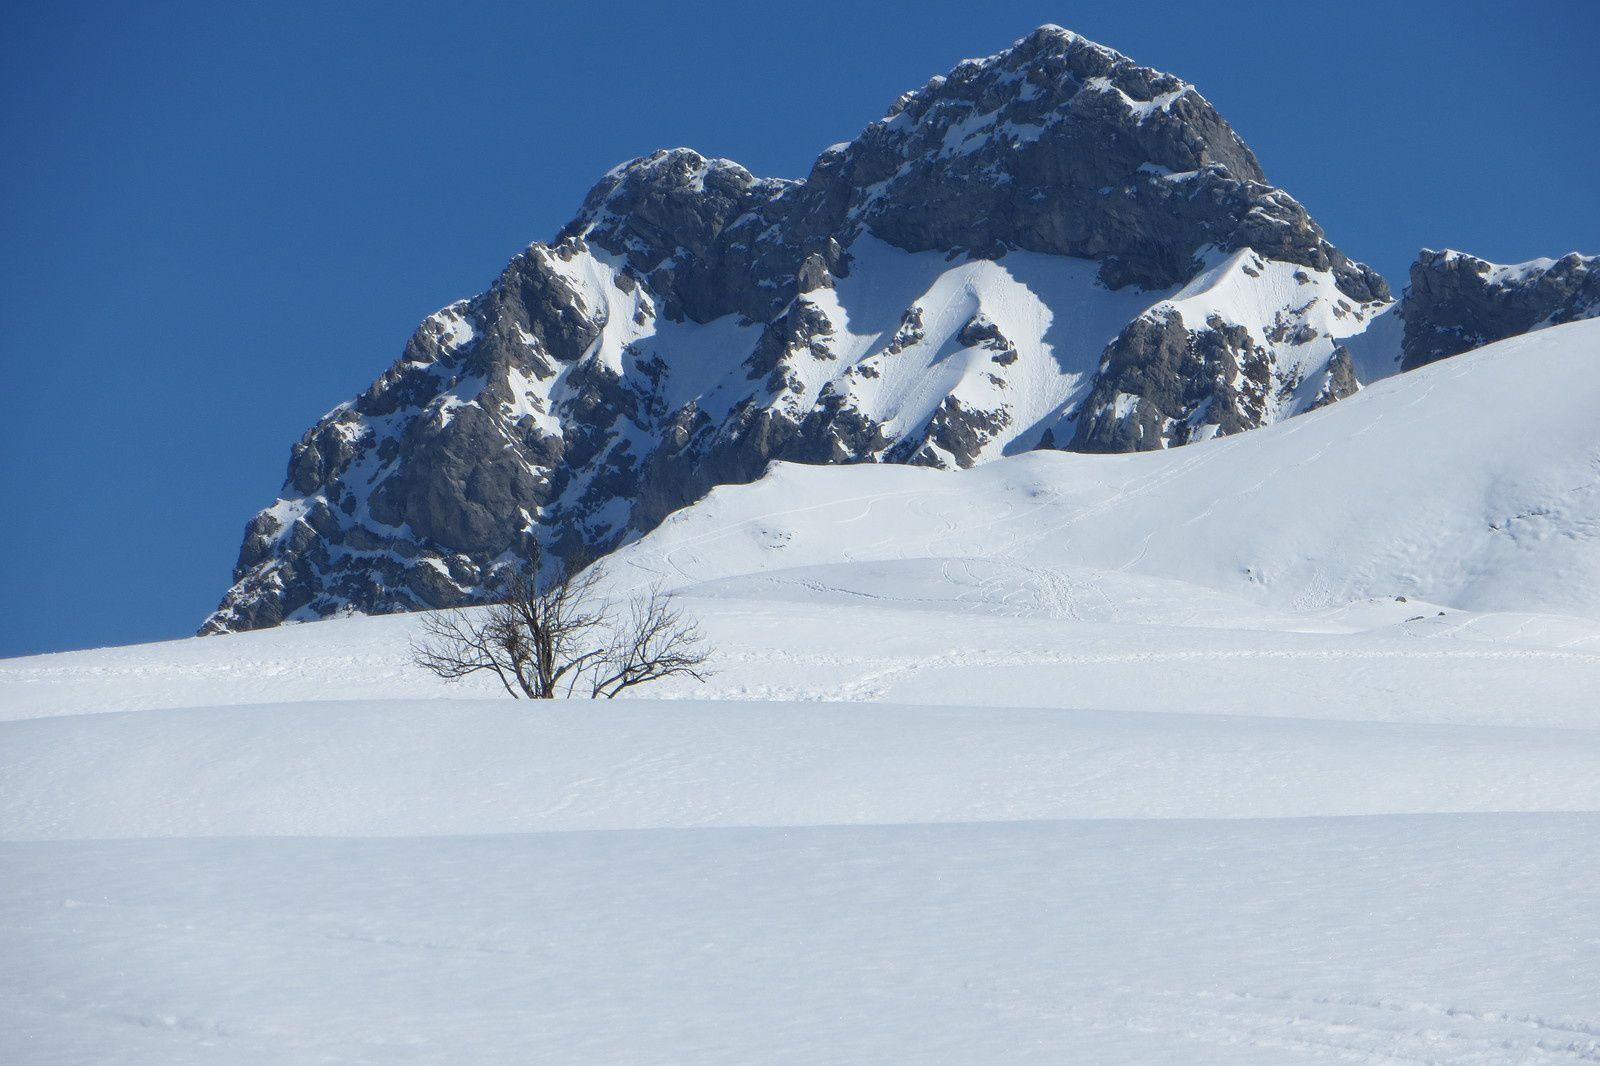 Pointe d'Arcalod 2217m